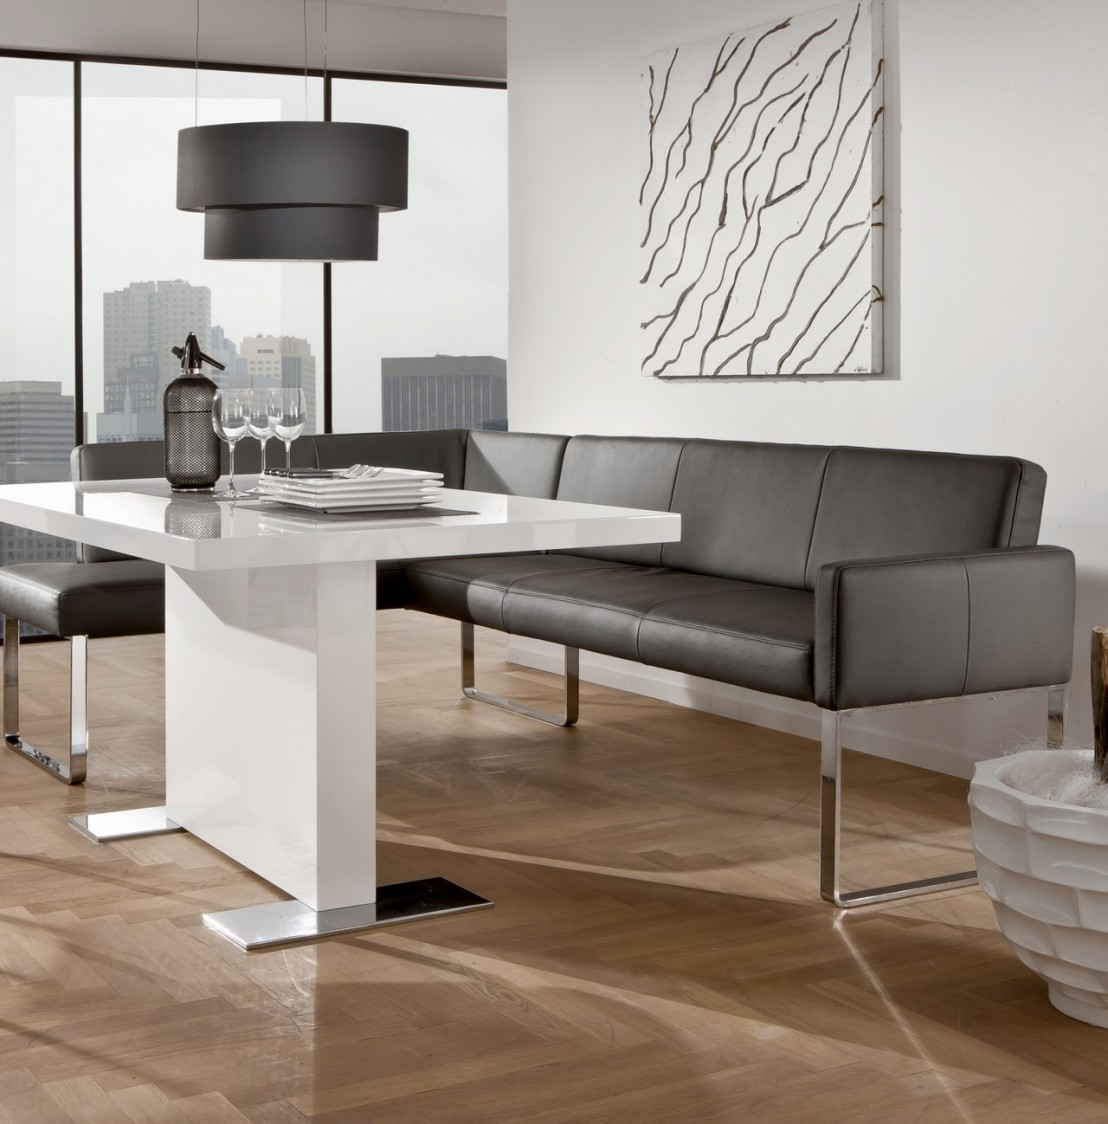 puredining banquette d 39 angle design 120 x 189 cm. Black Bedroom Furniture Sets. Home Design Ideas